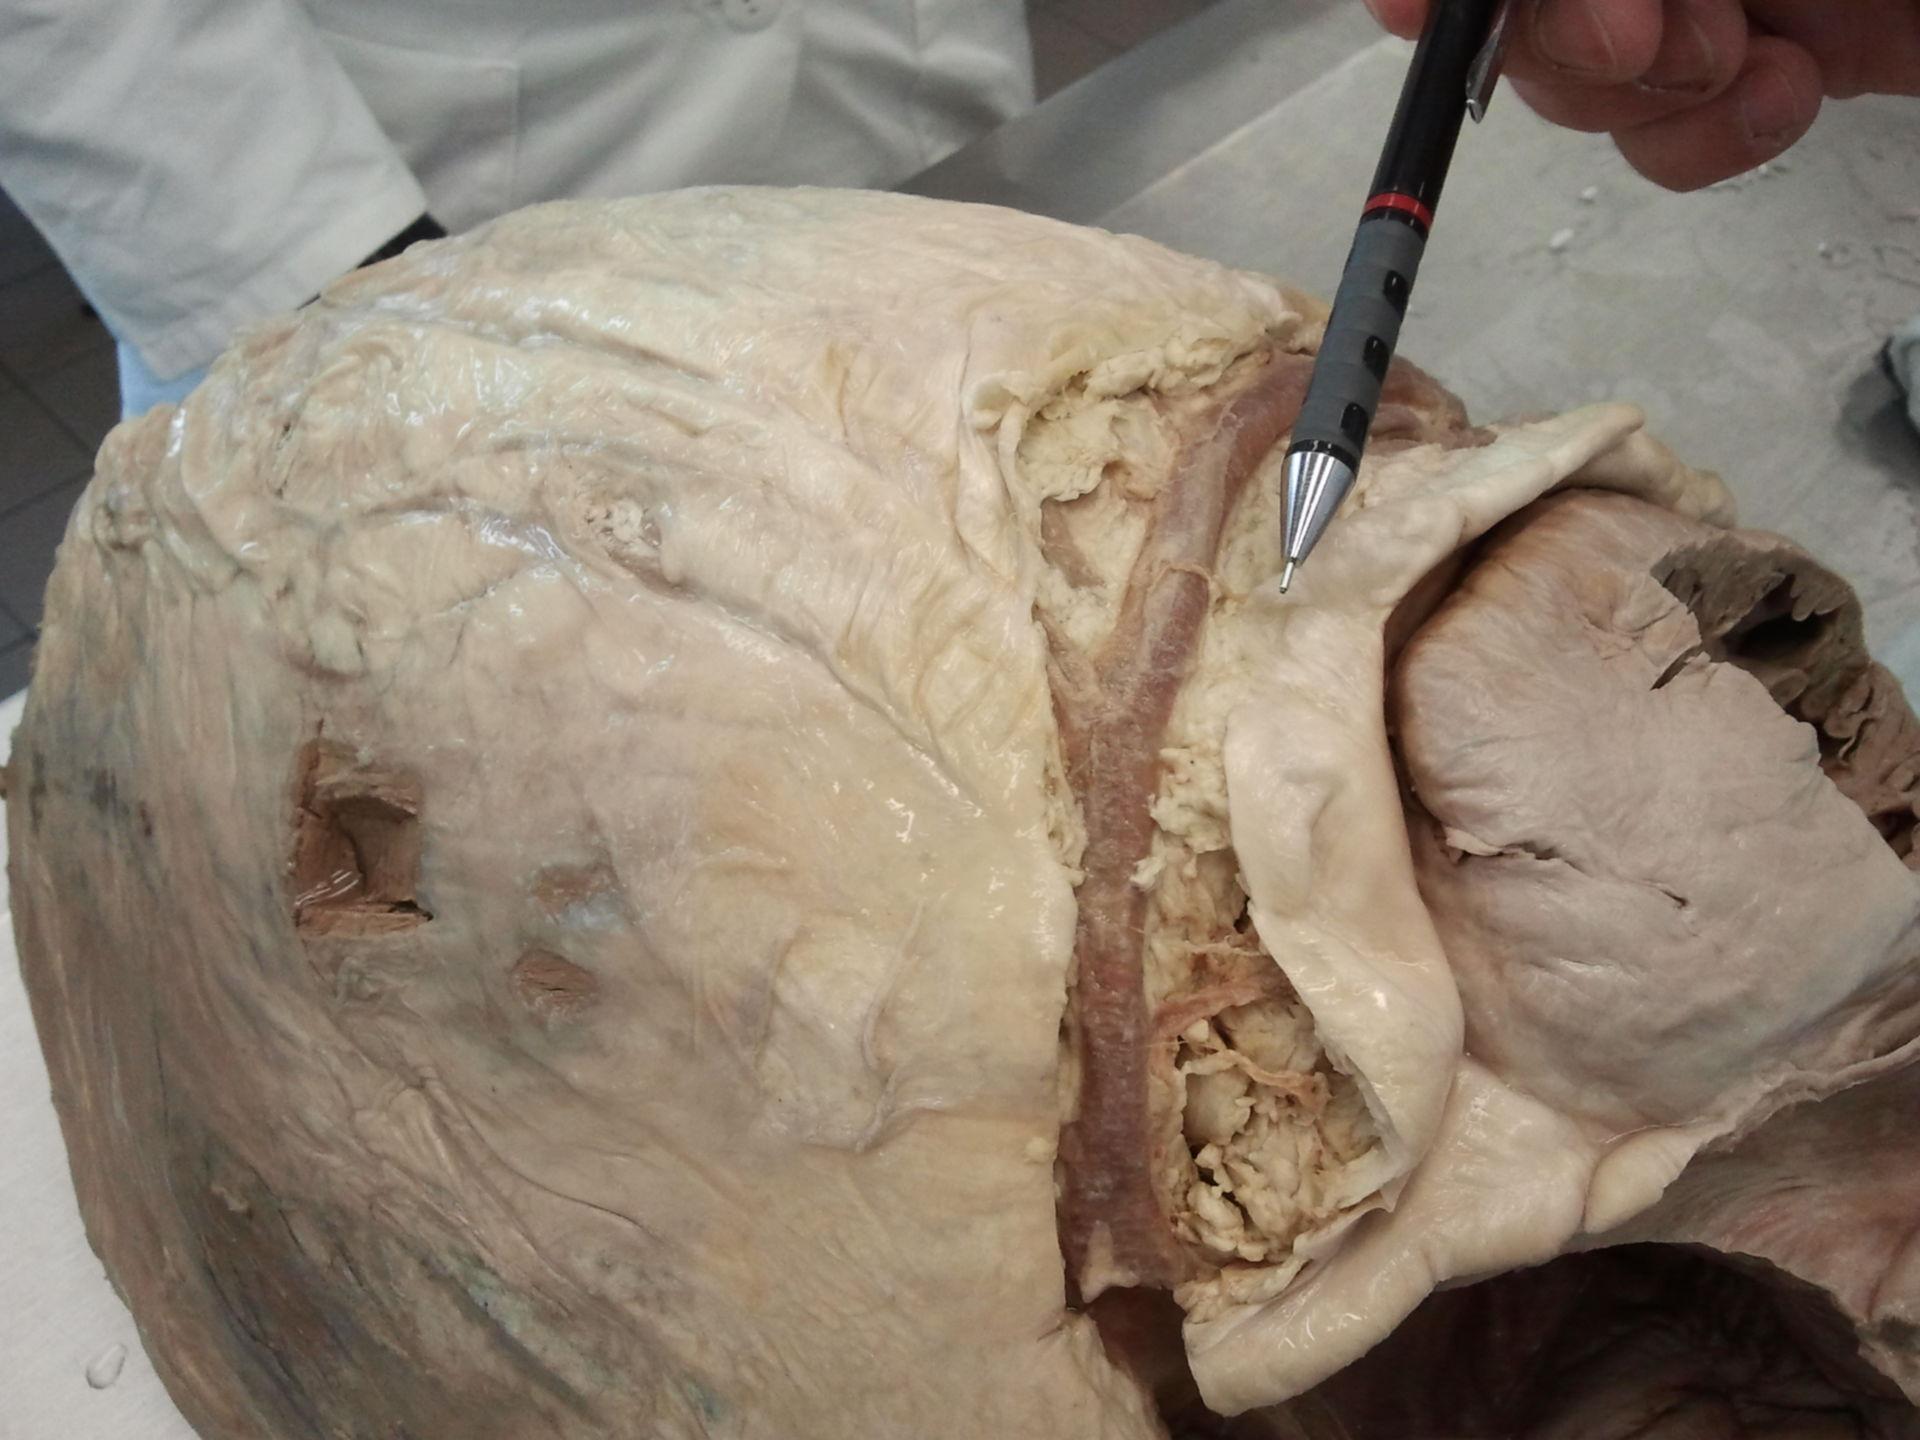 Coronary artery of elephant's heart 2